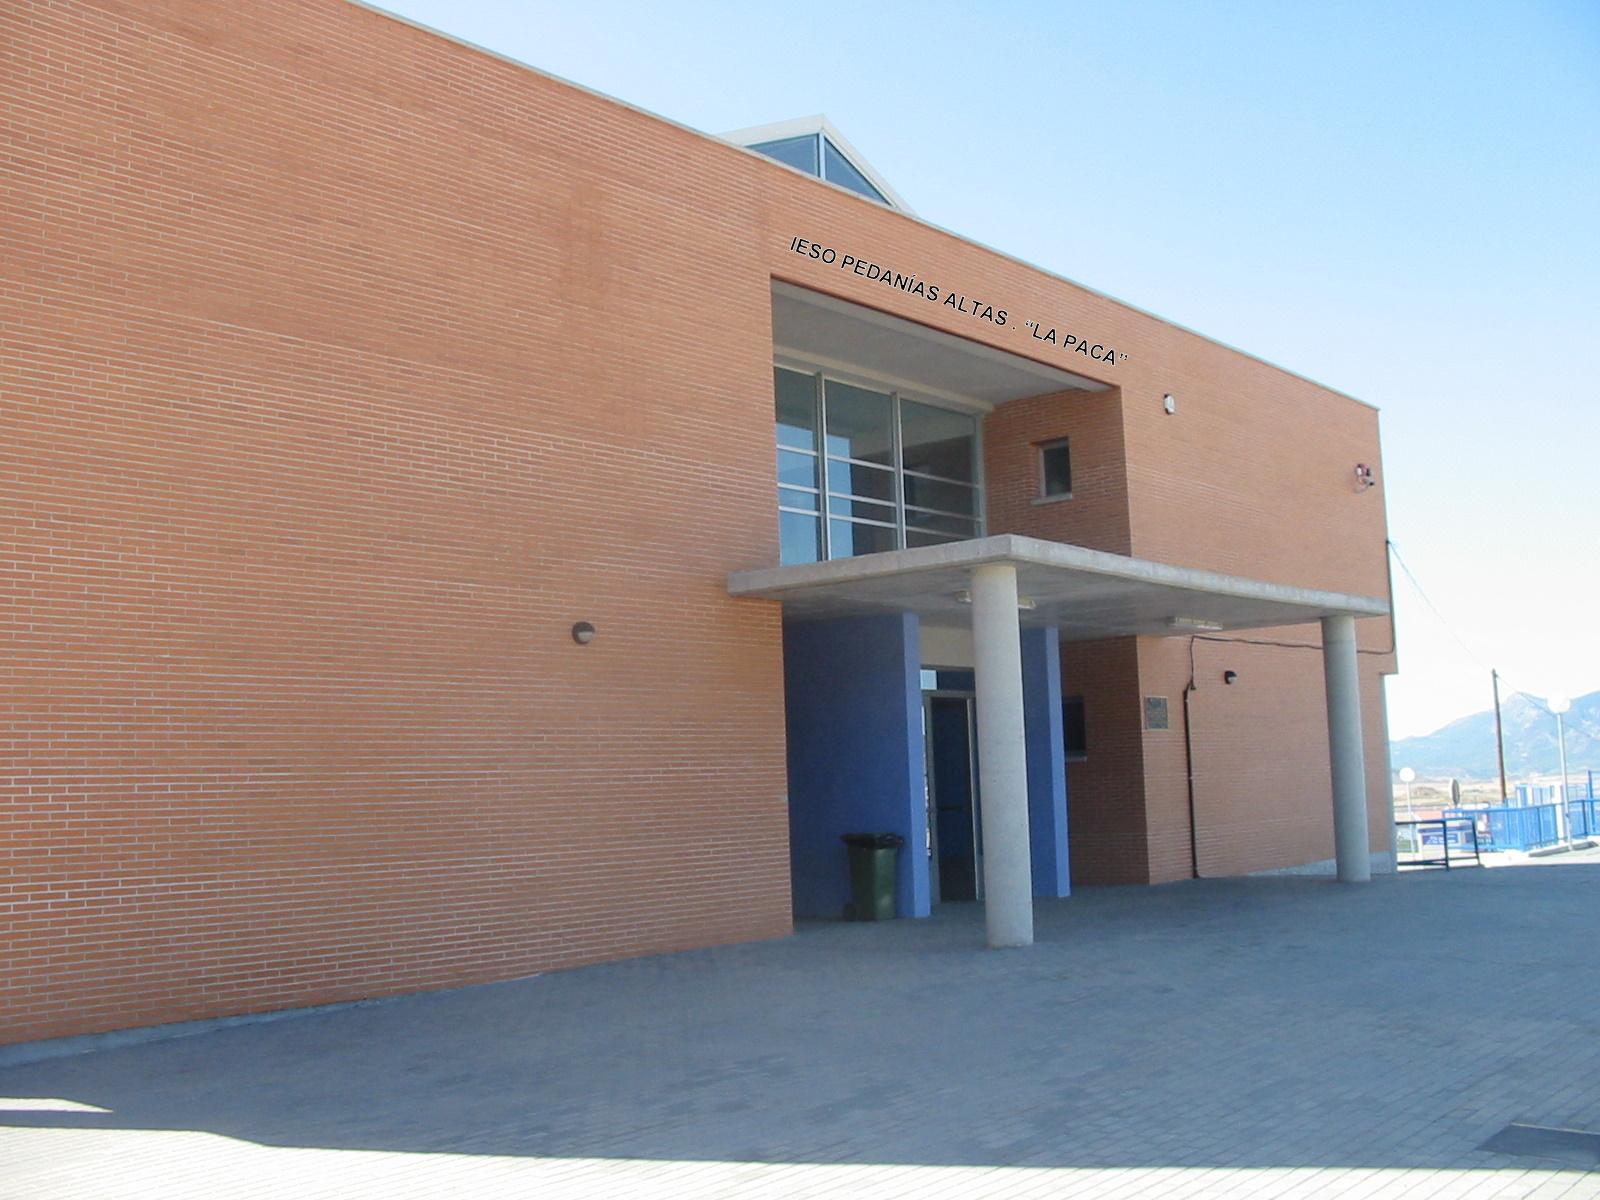 Instituto de Educación Secundaria Obligatoria Pedanías Altas